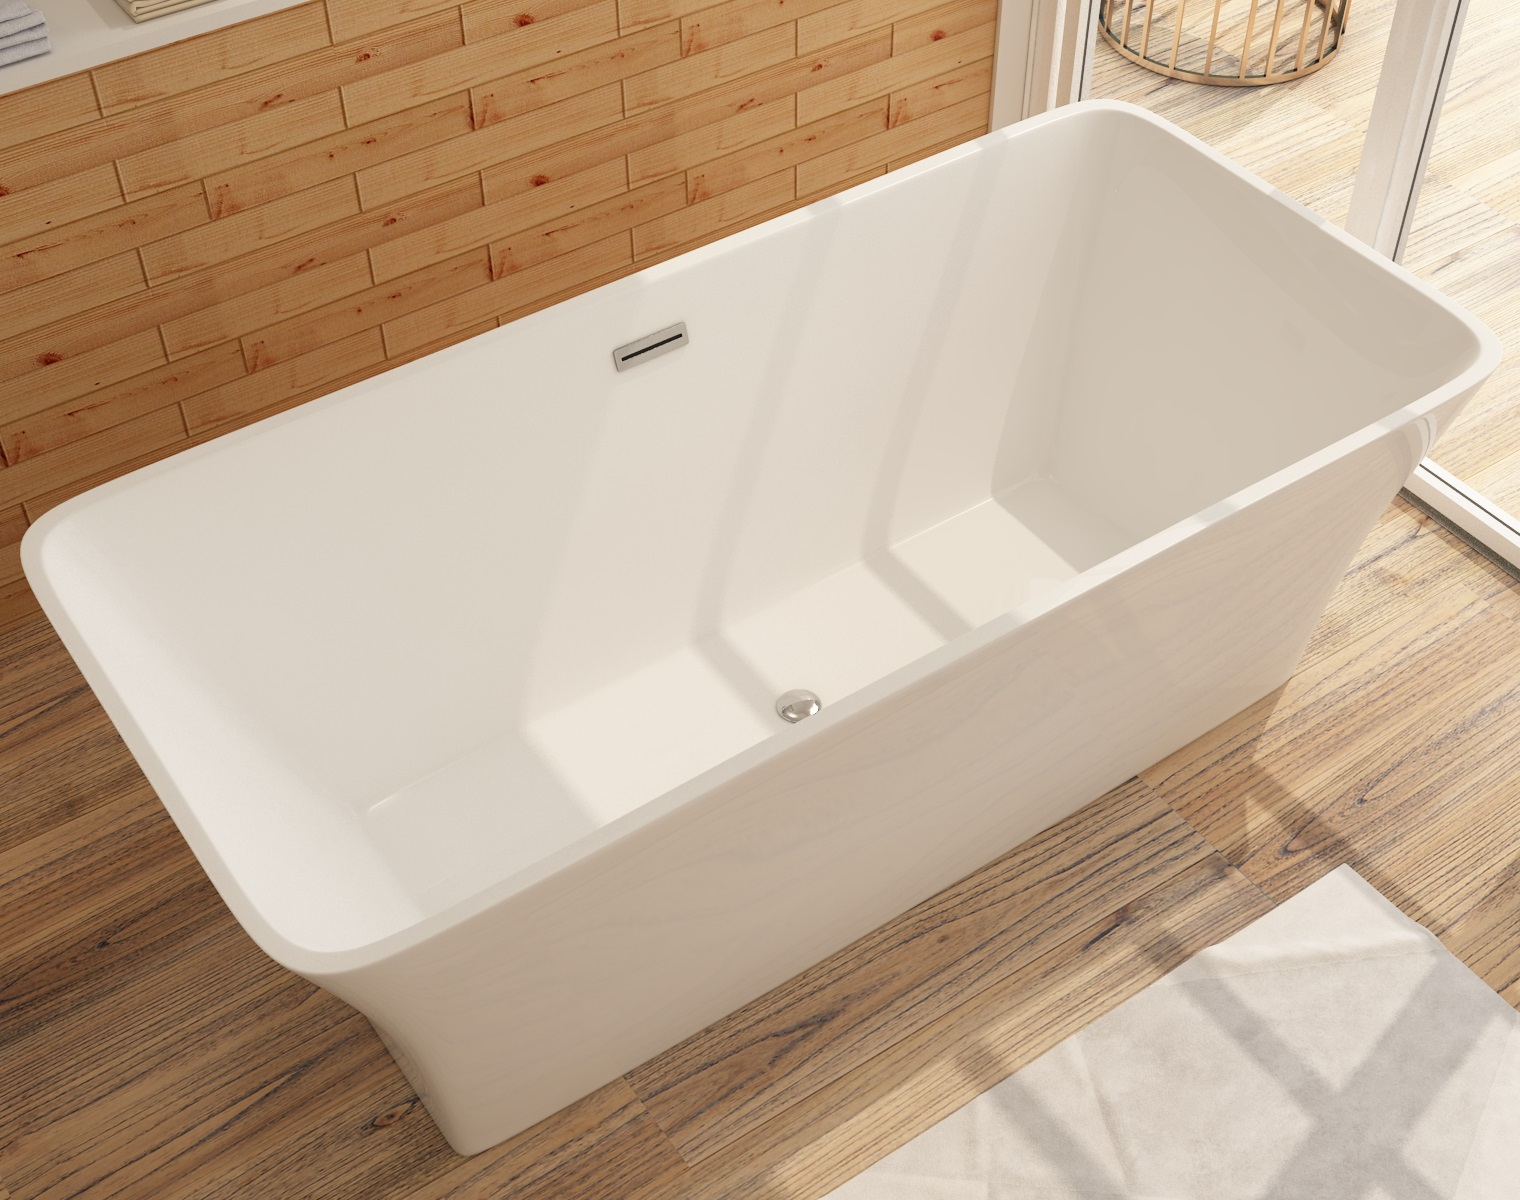 Badewanne aus Sanitäracryl Karlstat - ALLE GRÖßEN